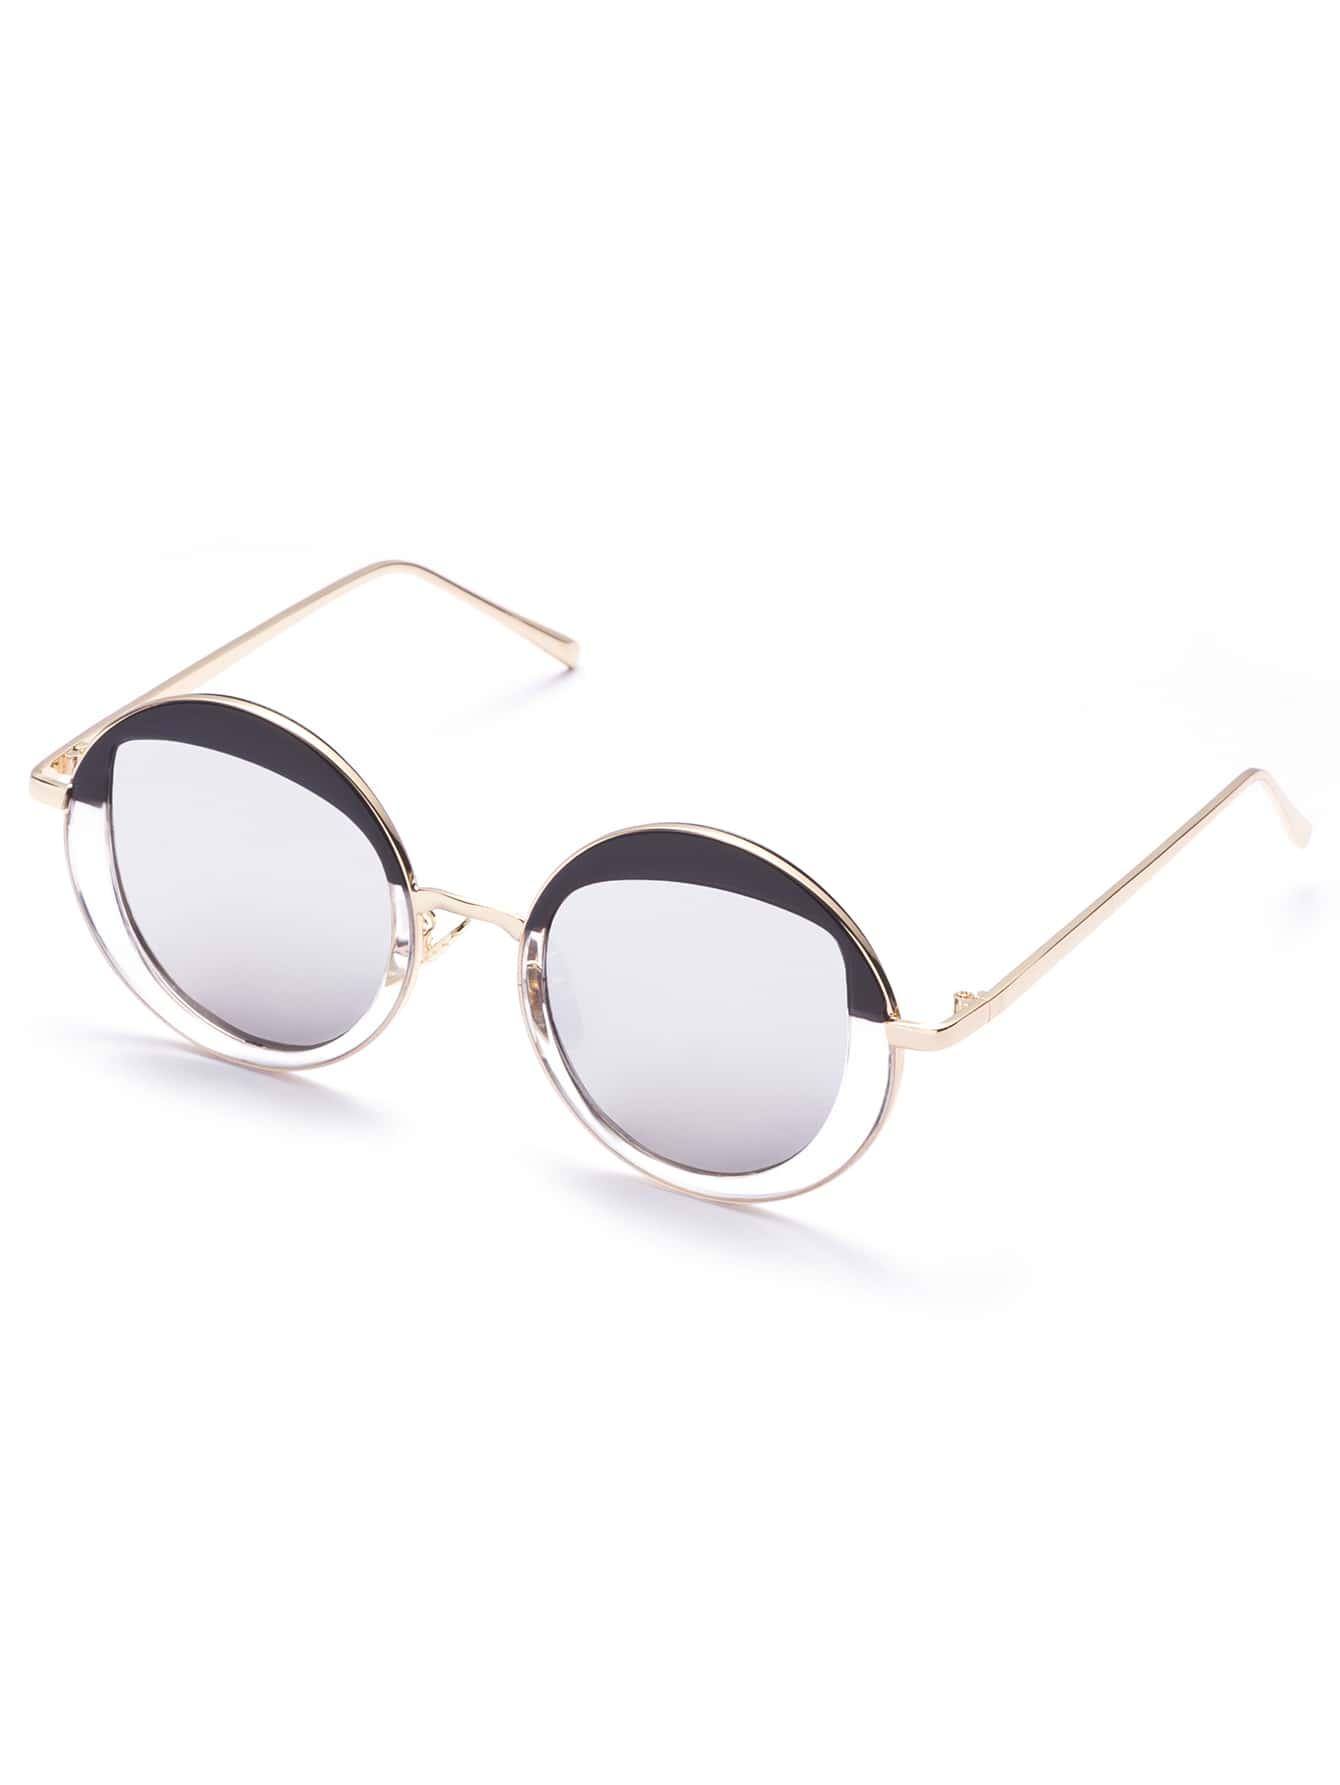 Gold Frame Chic Round Sunglasses